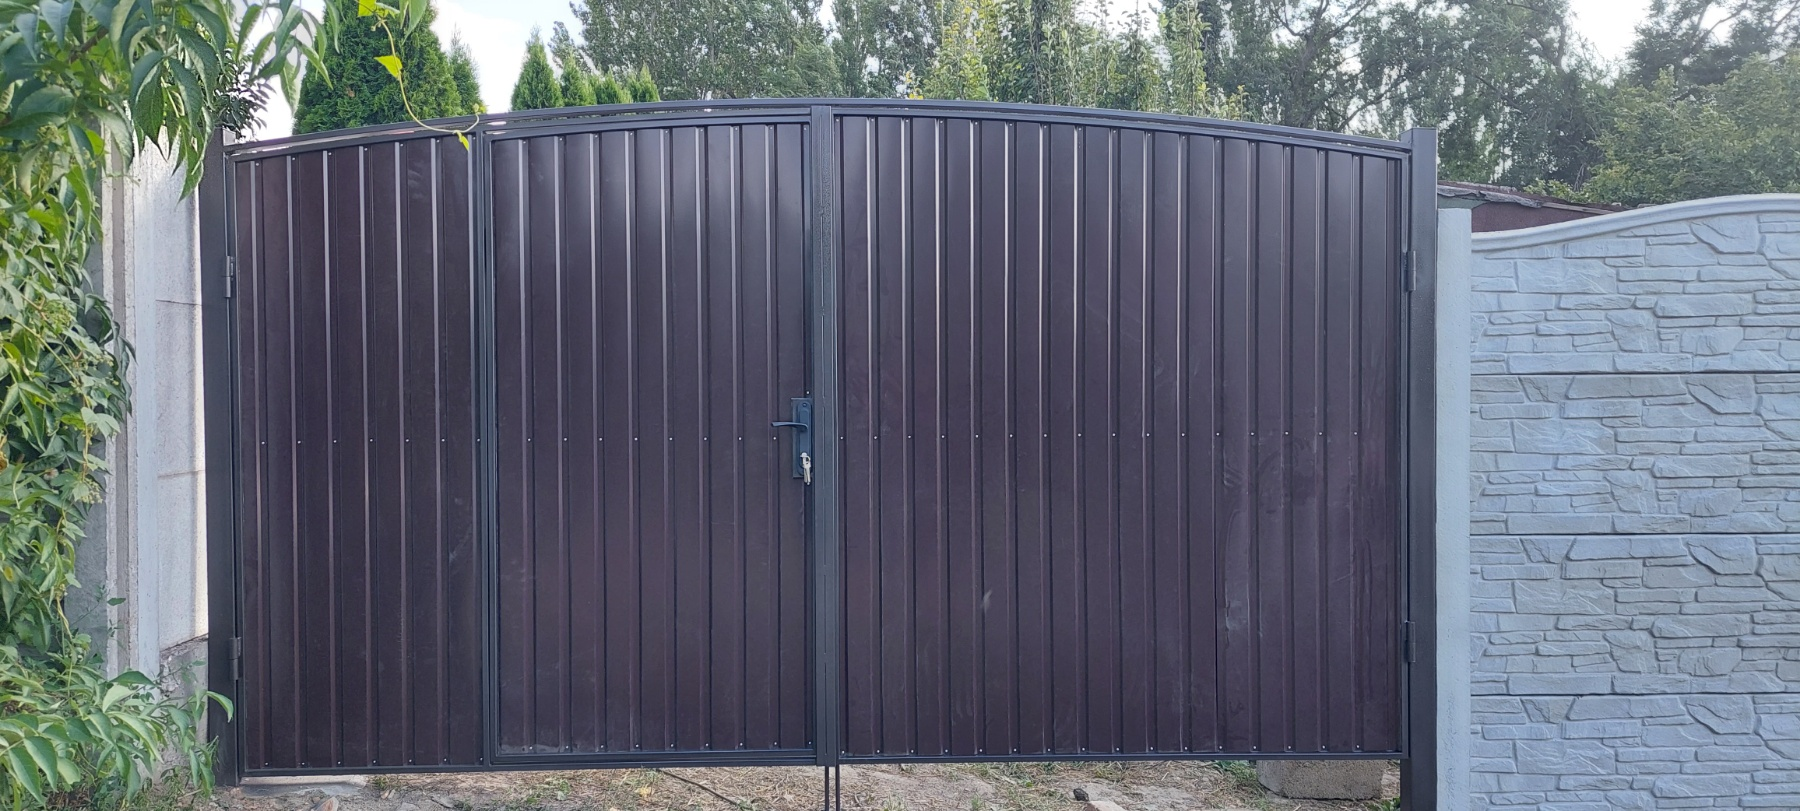 Установка бетонного забора г. Запорожье ул.Осипенка